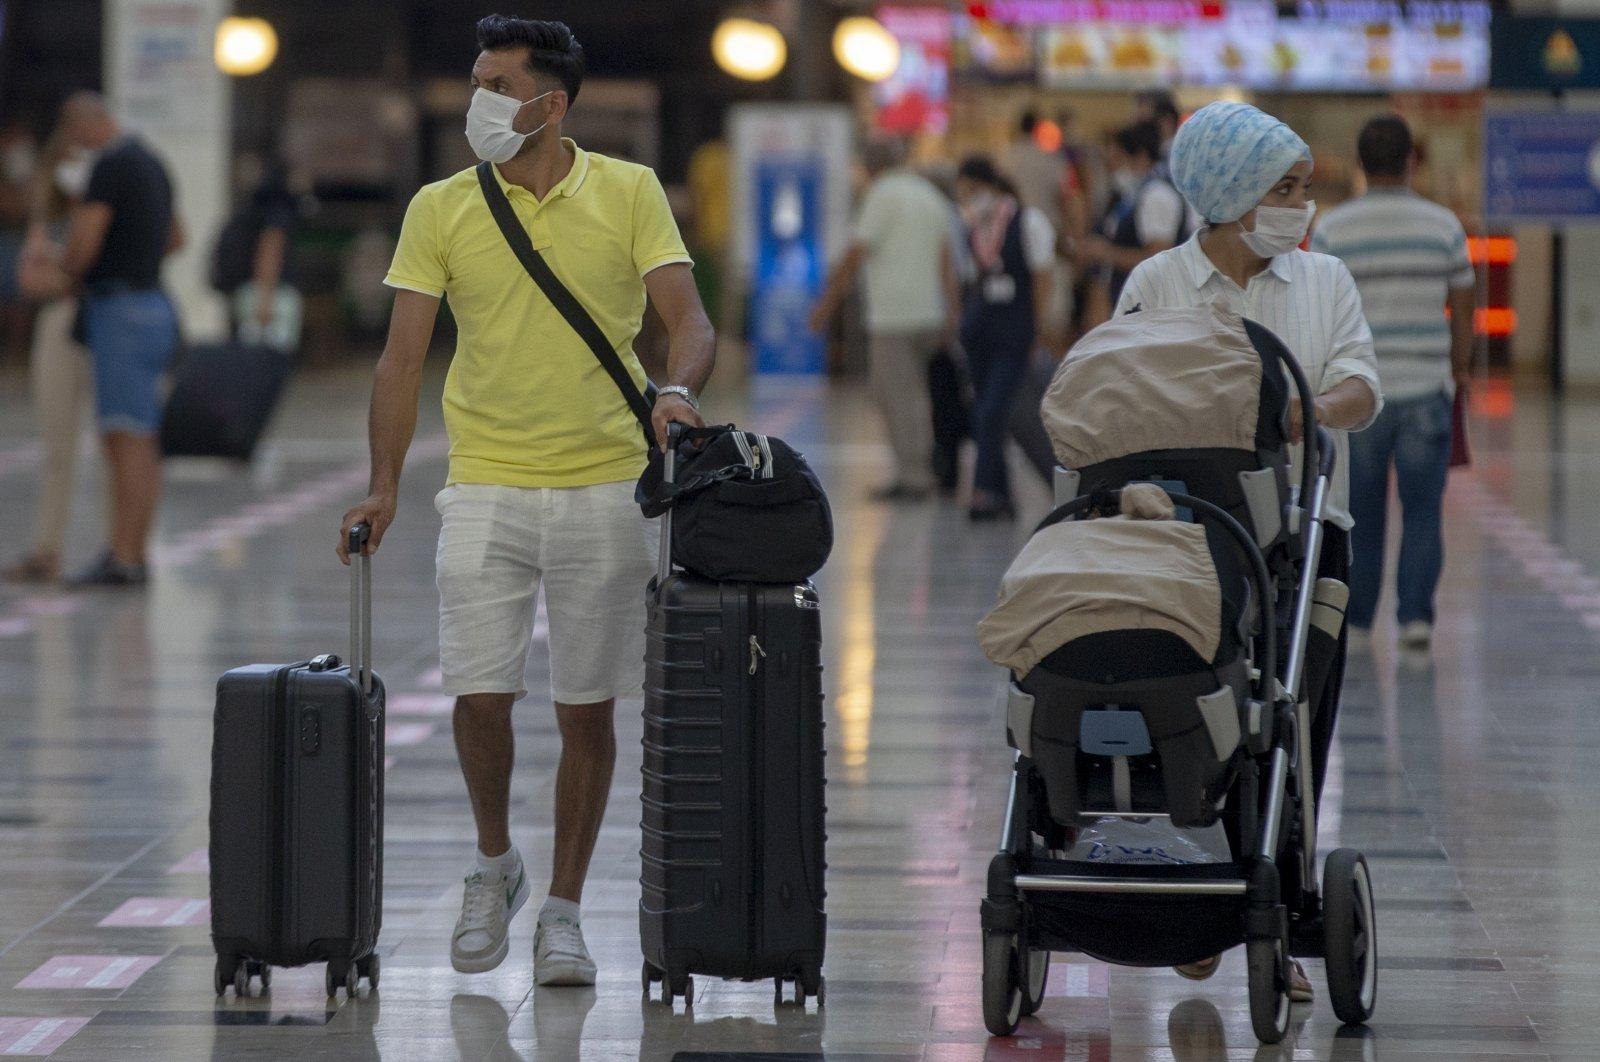 Passengers at Antalya Airport in southern Antalya province, Turkey, Aug. 15, 2020. (AA Photo)